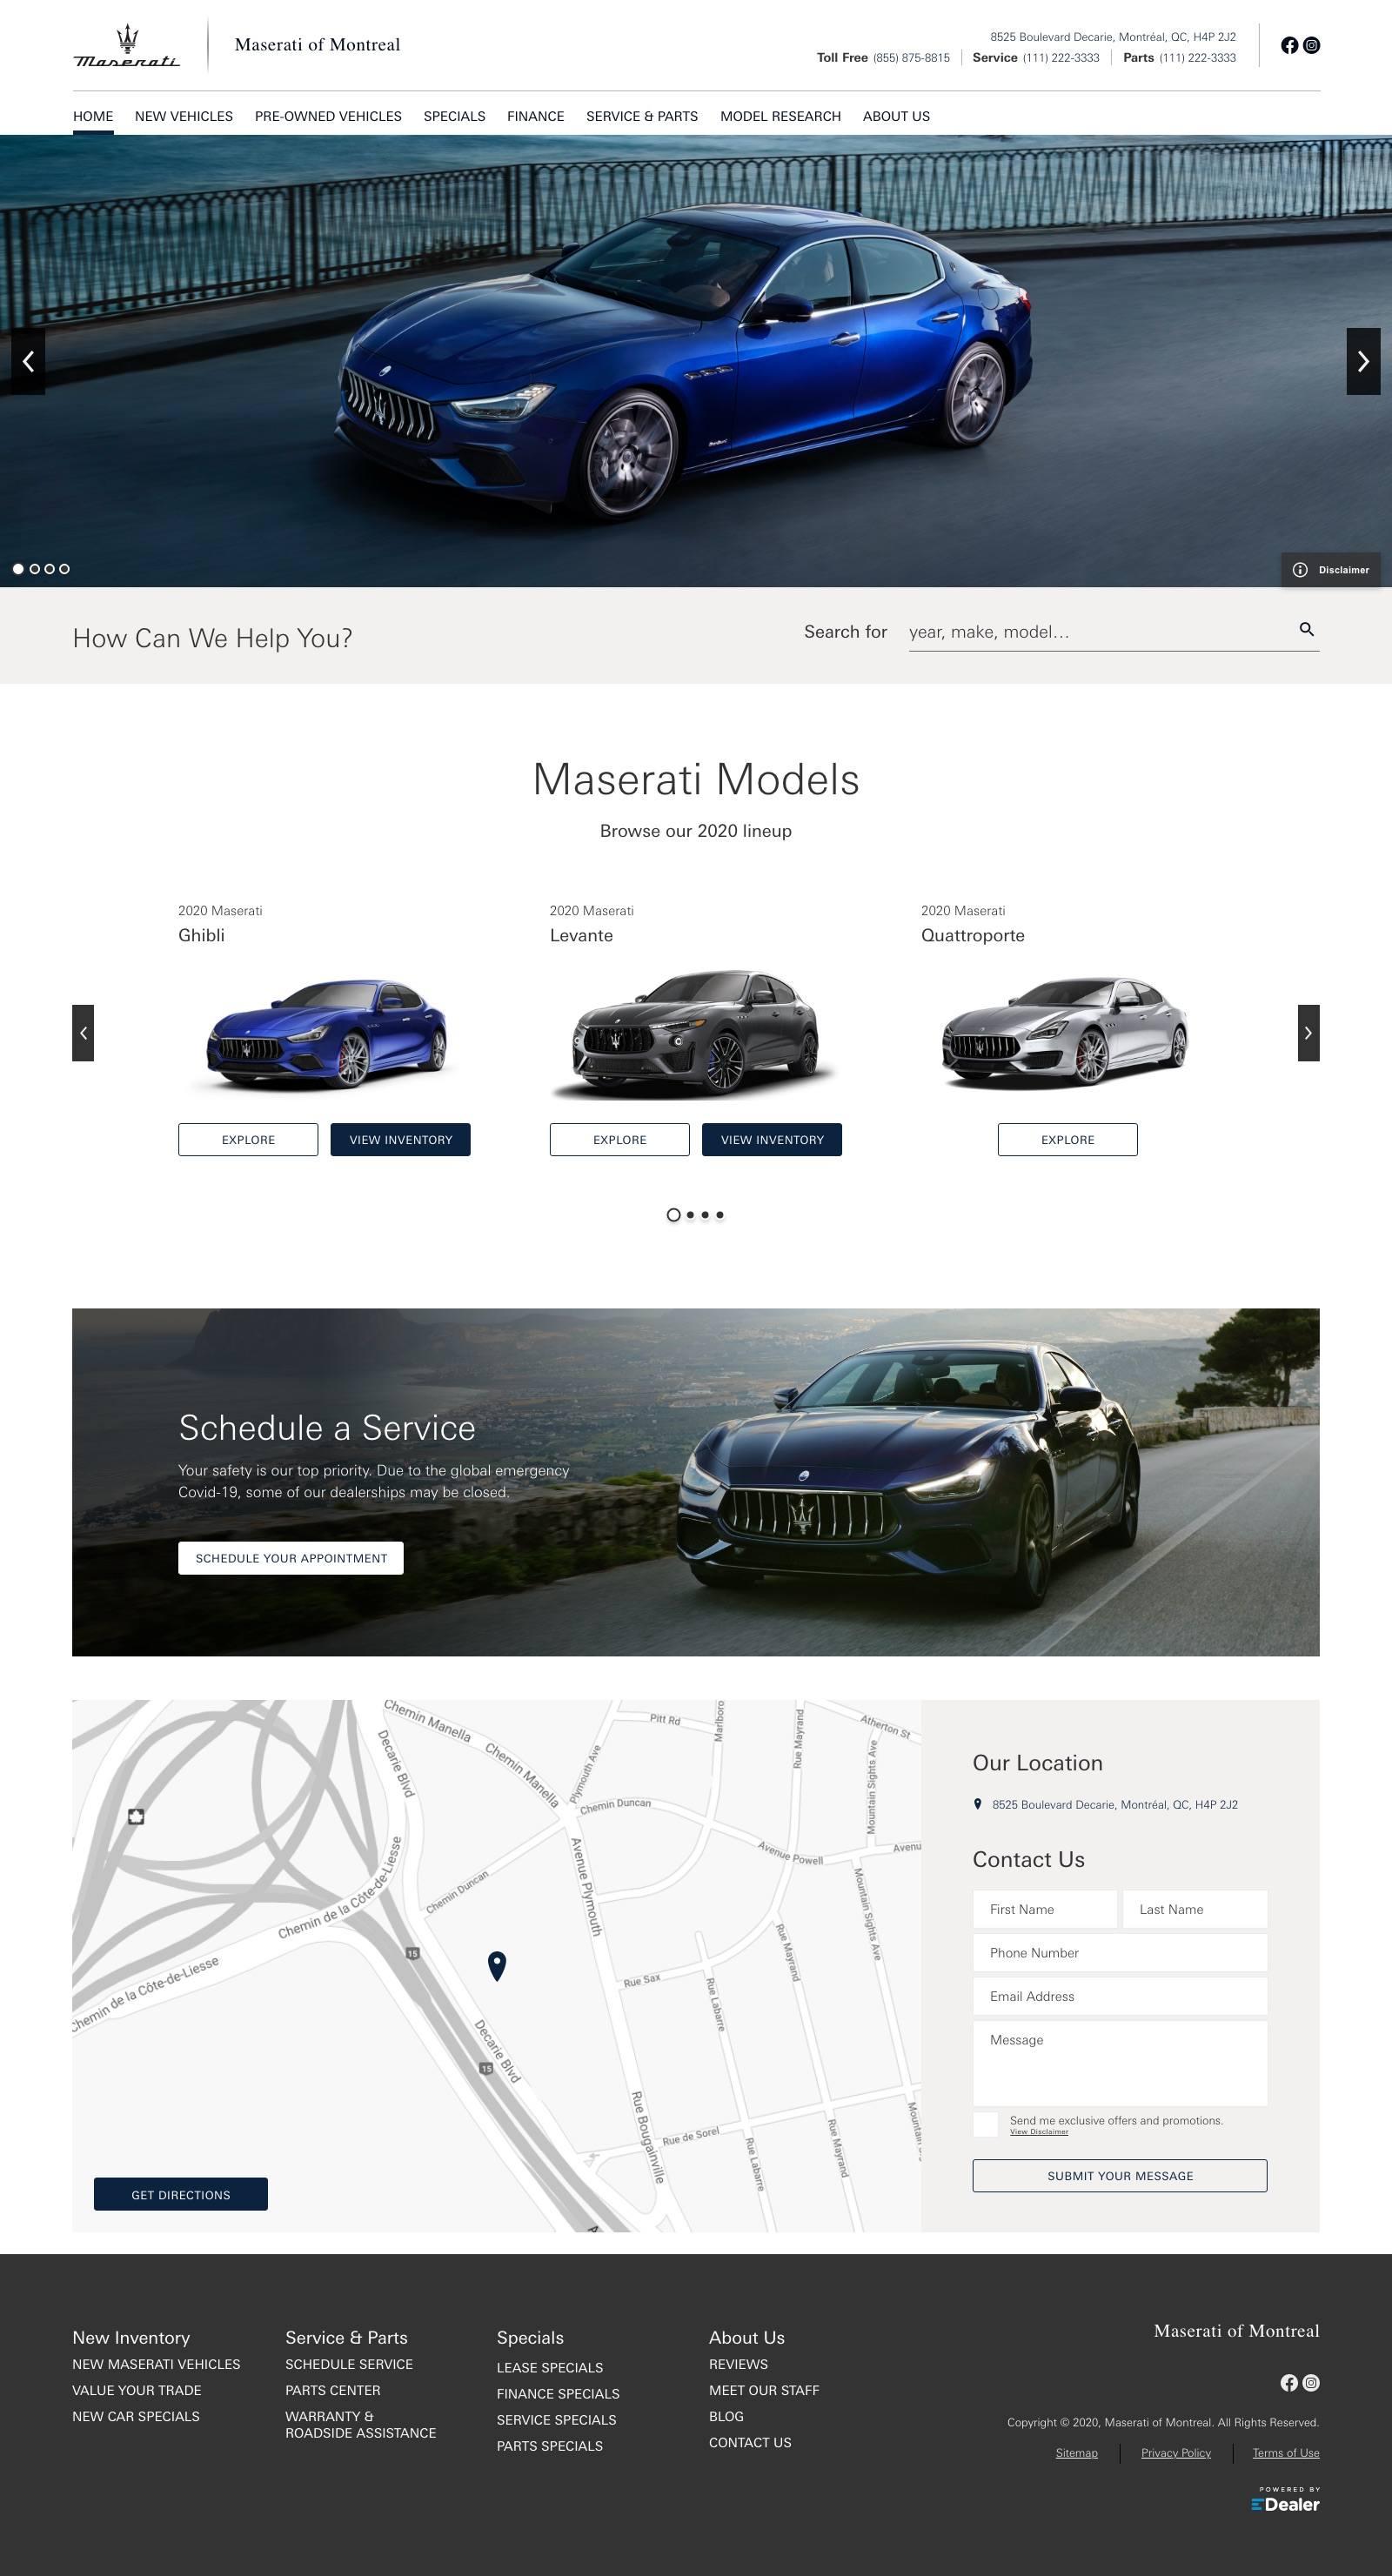 Maserati of Montreal